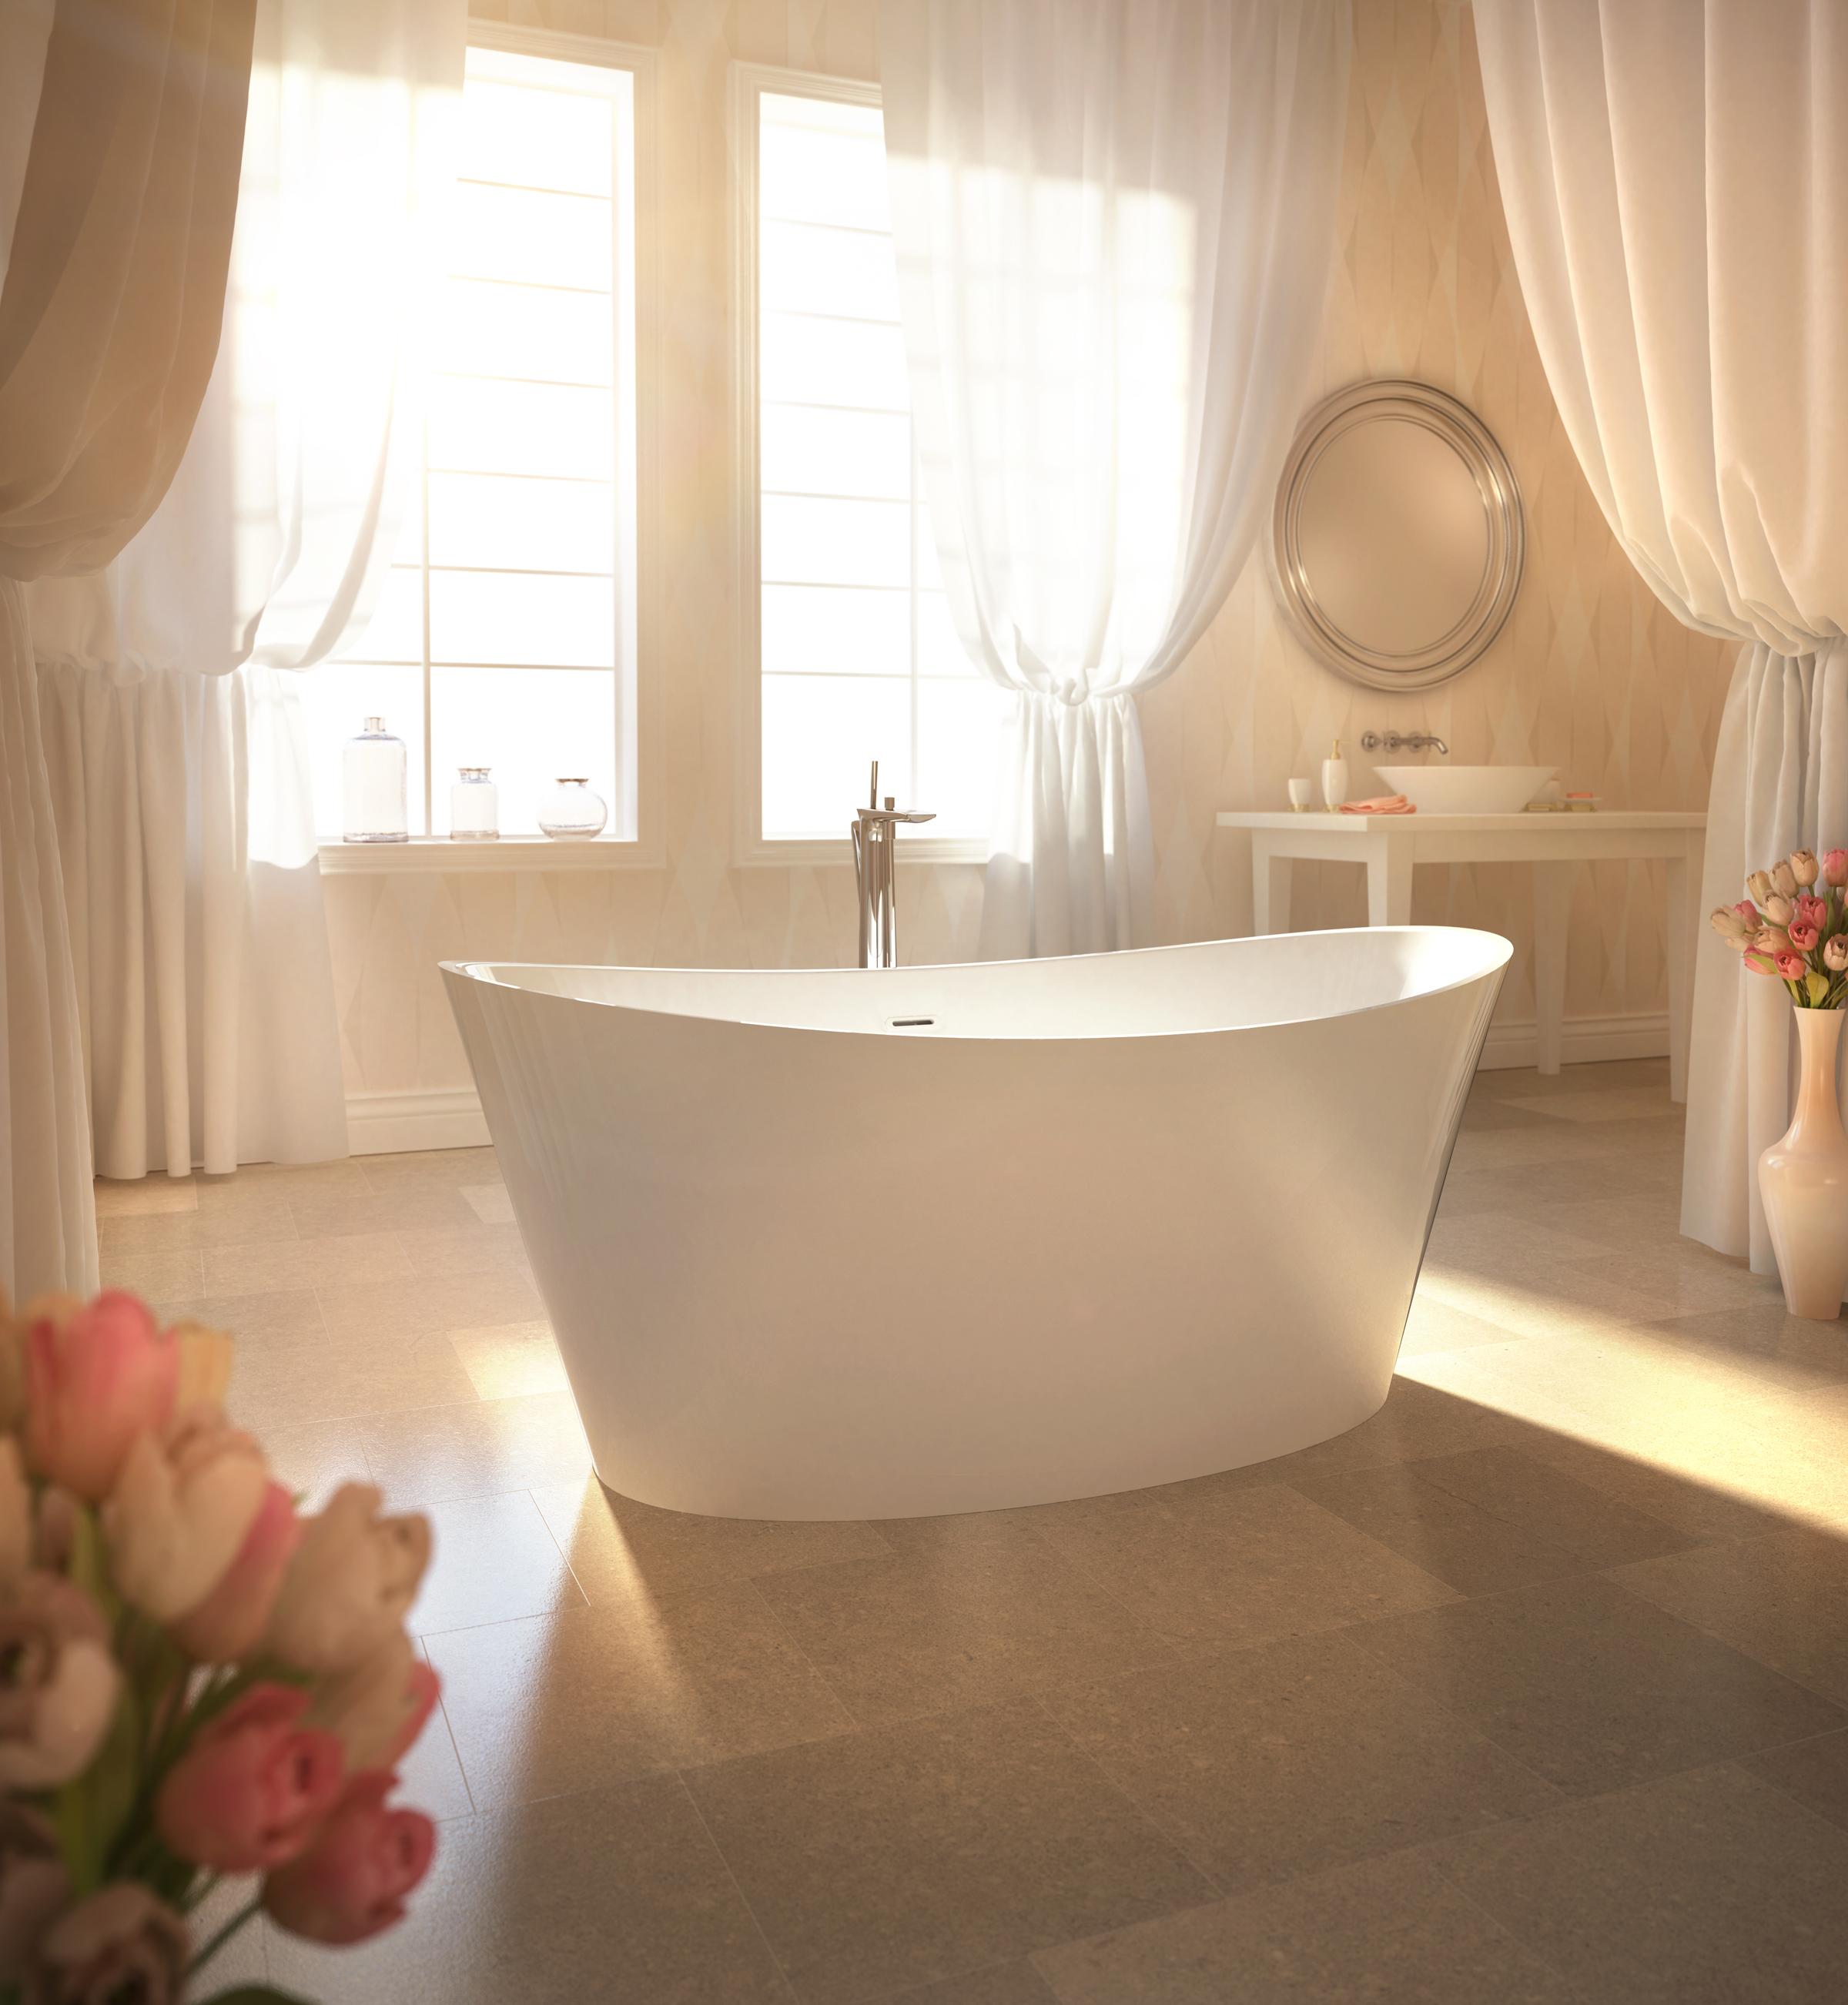 Bain Ultra Beautiful Evanescence Oval Therapeutic Baths